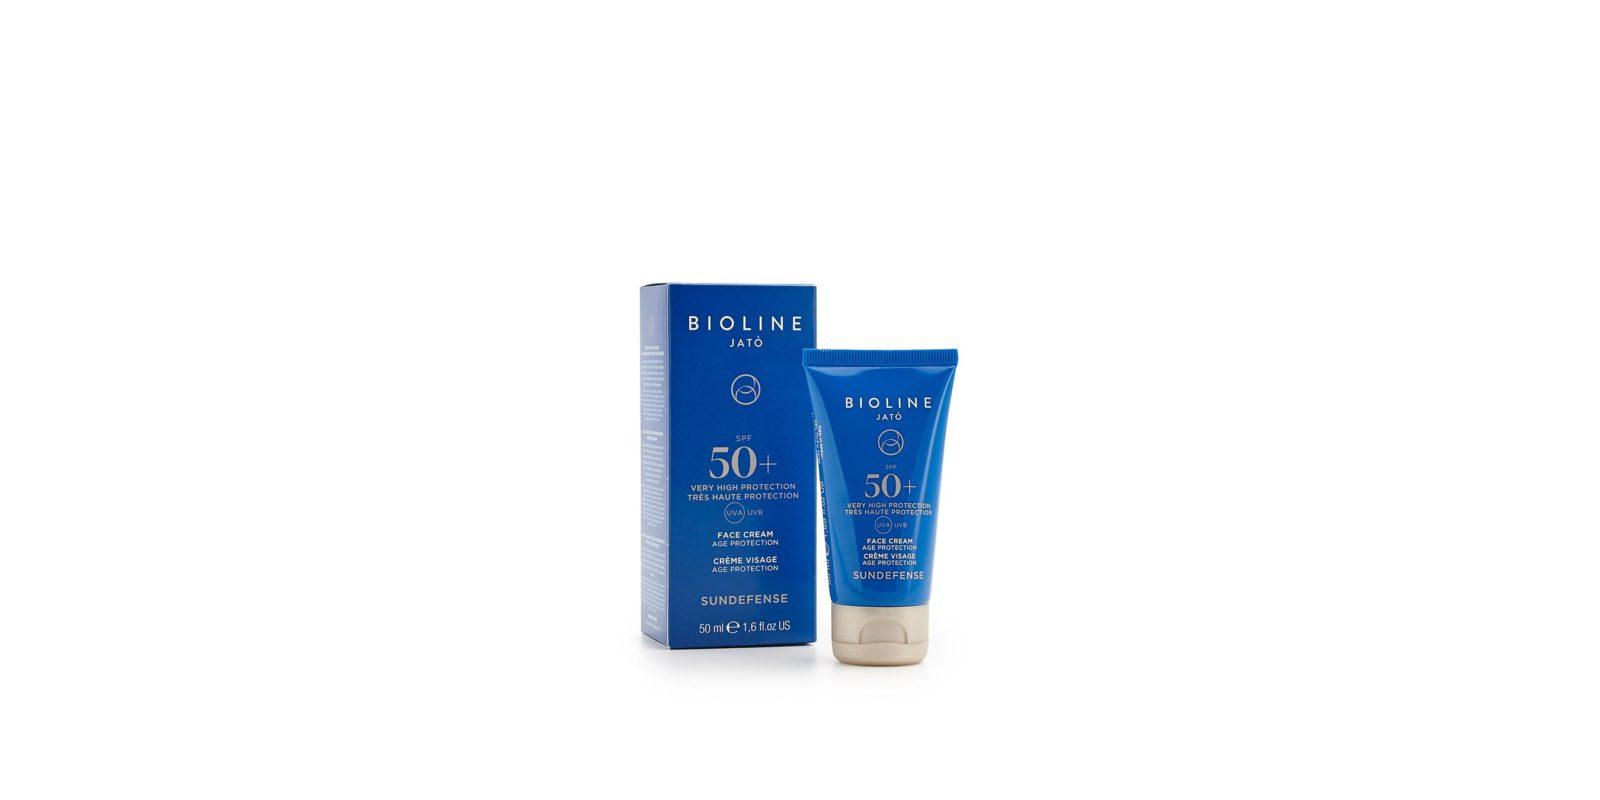 Bioline Jatò Sundefense Very High Protection Cream